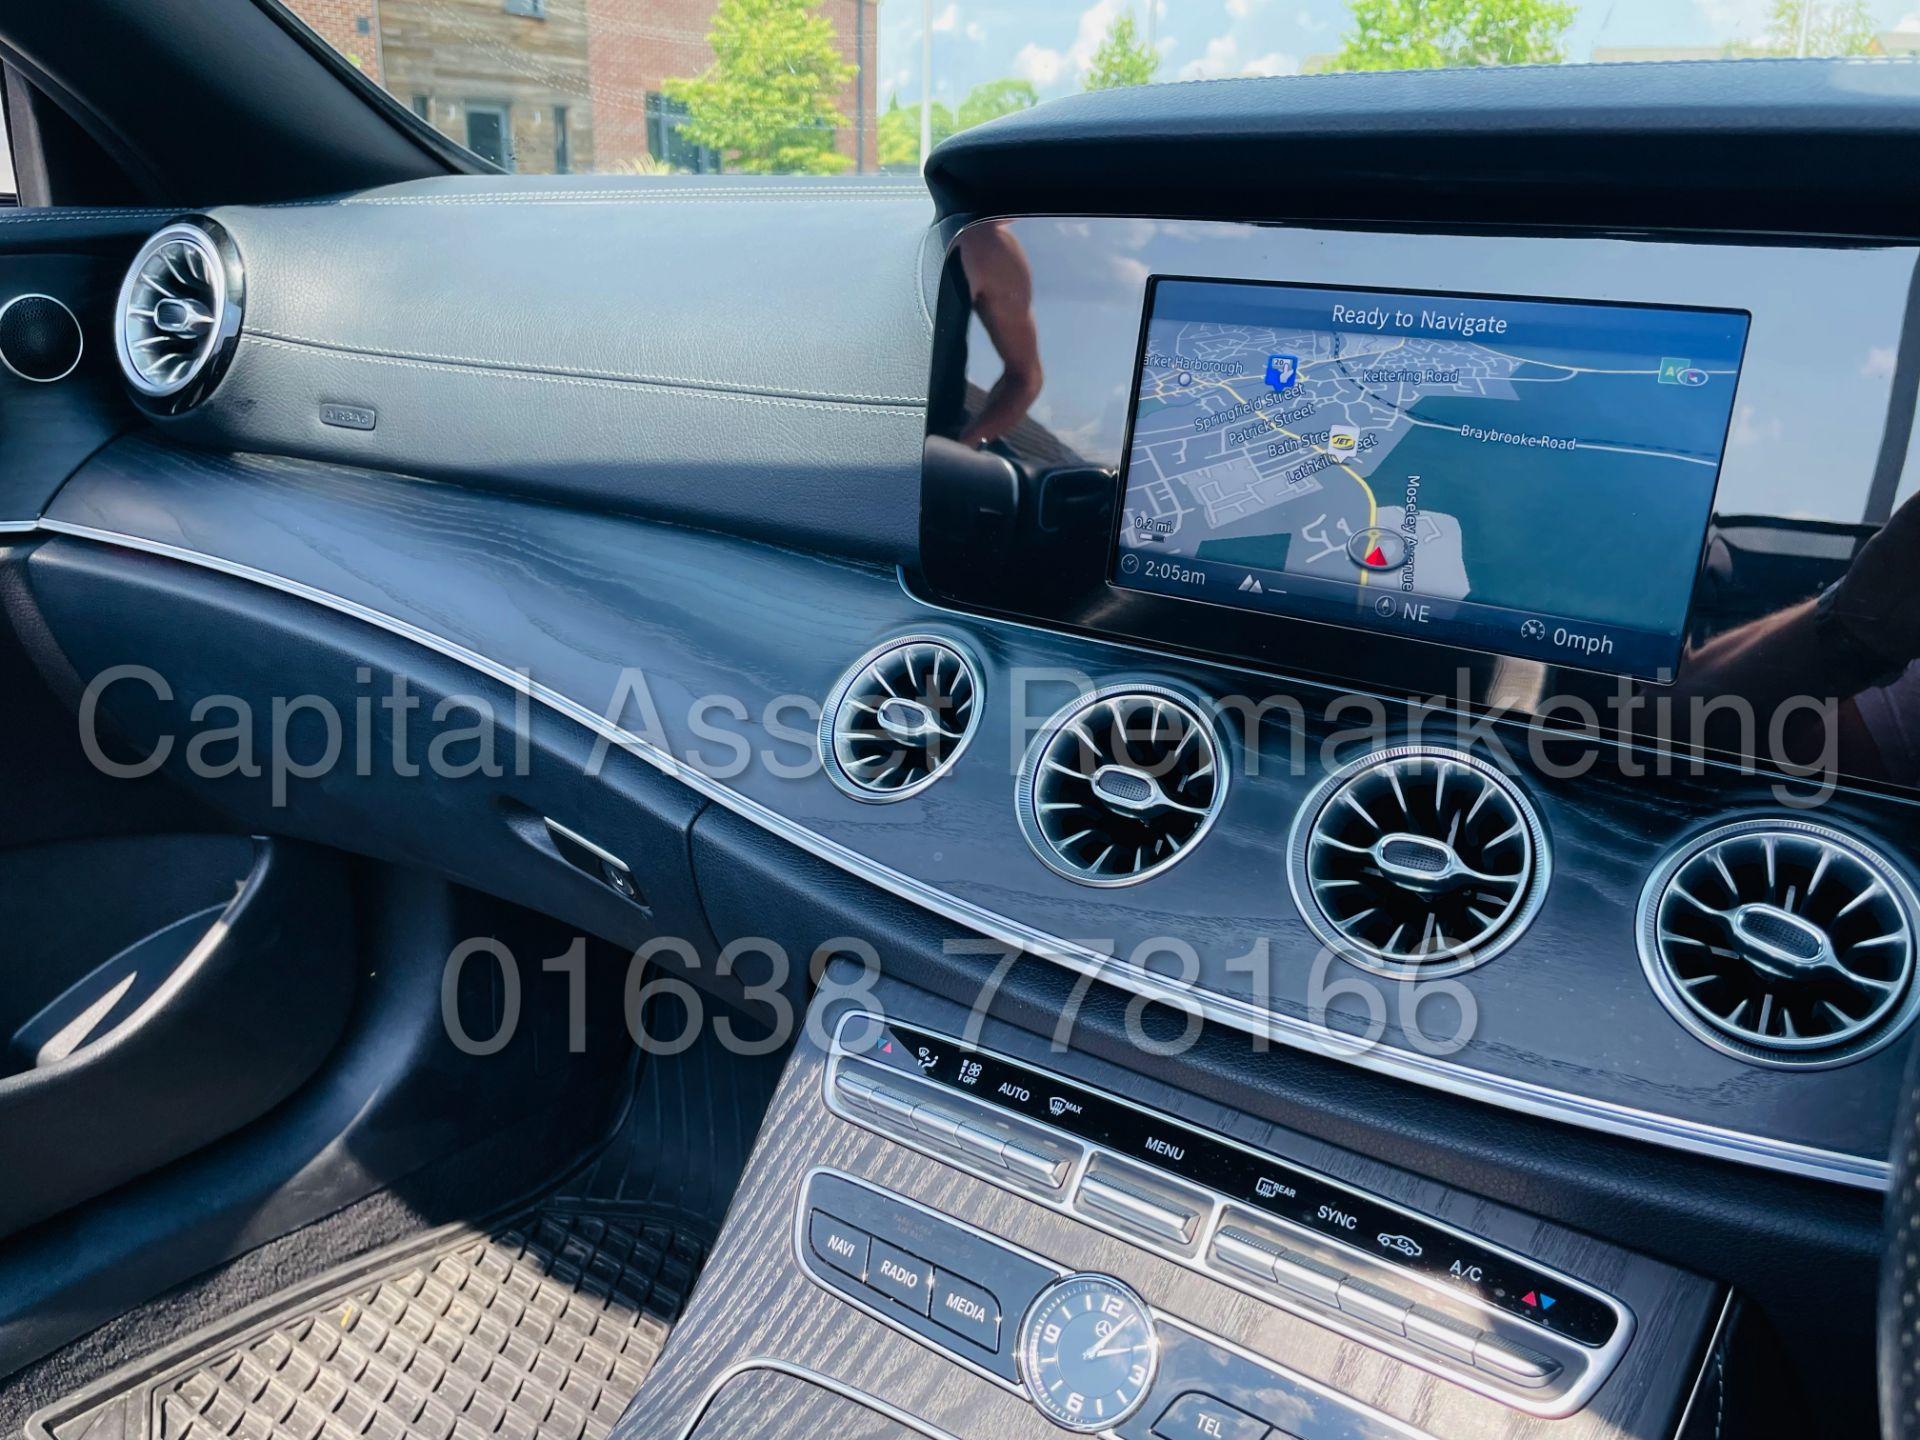 MERCEDES-BENZ E220d *AMG LINE PREMIUM - CABRIOLET* (2018 - EURO 6) '9G AUTO - LEATHER - SAT NAV' - Image 54 of 63